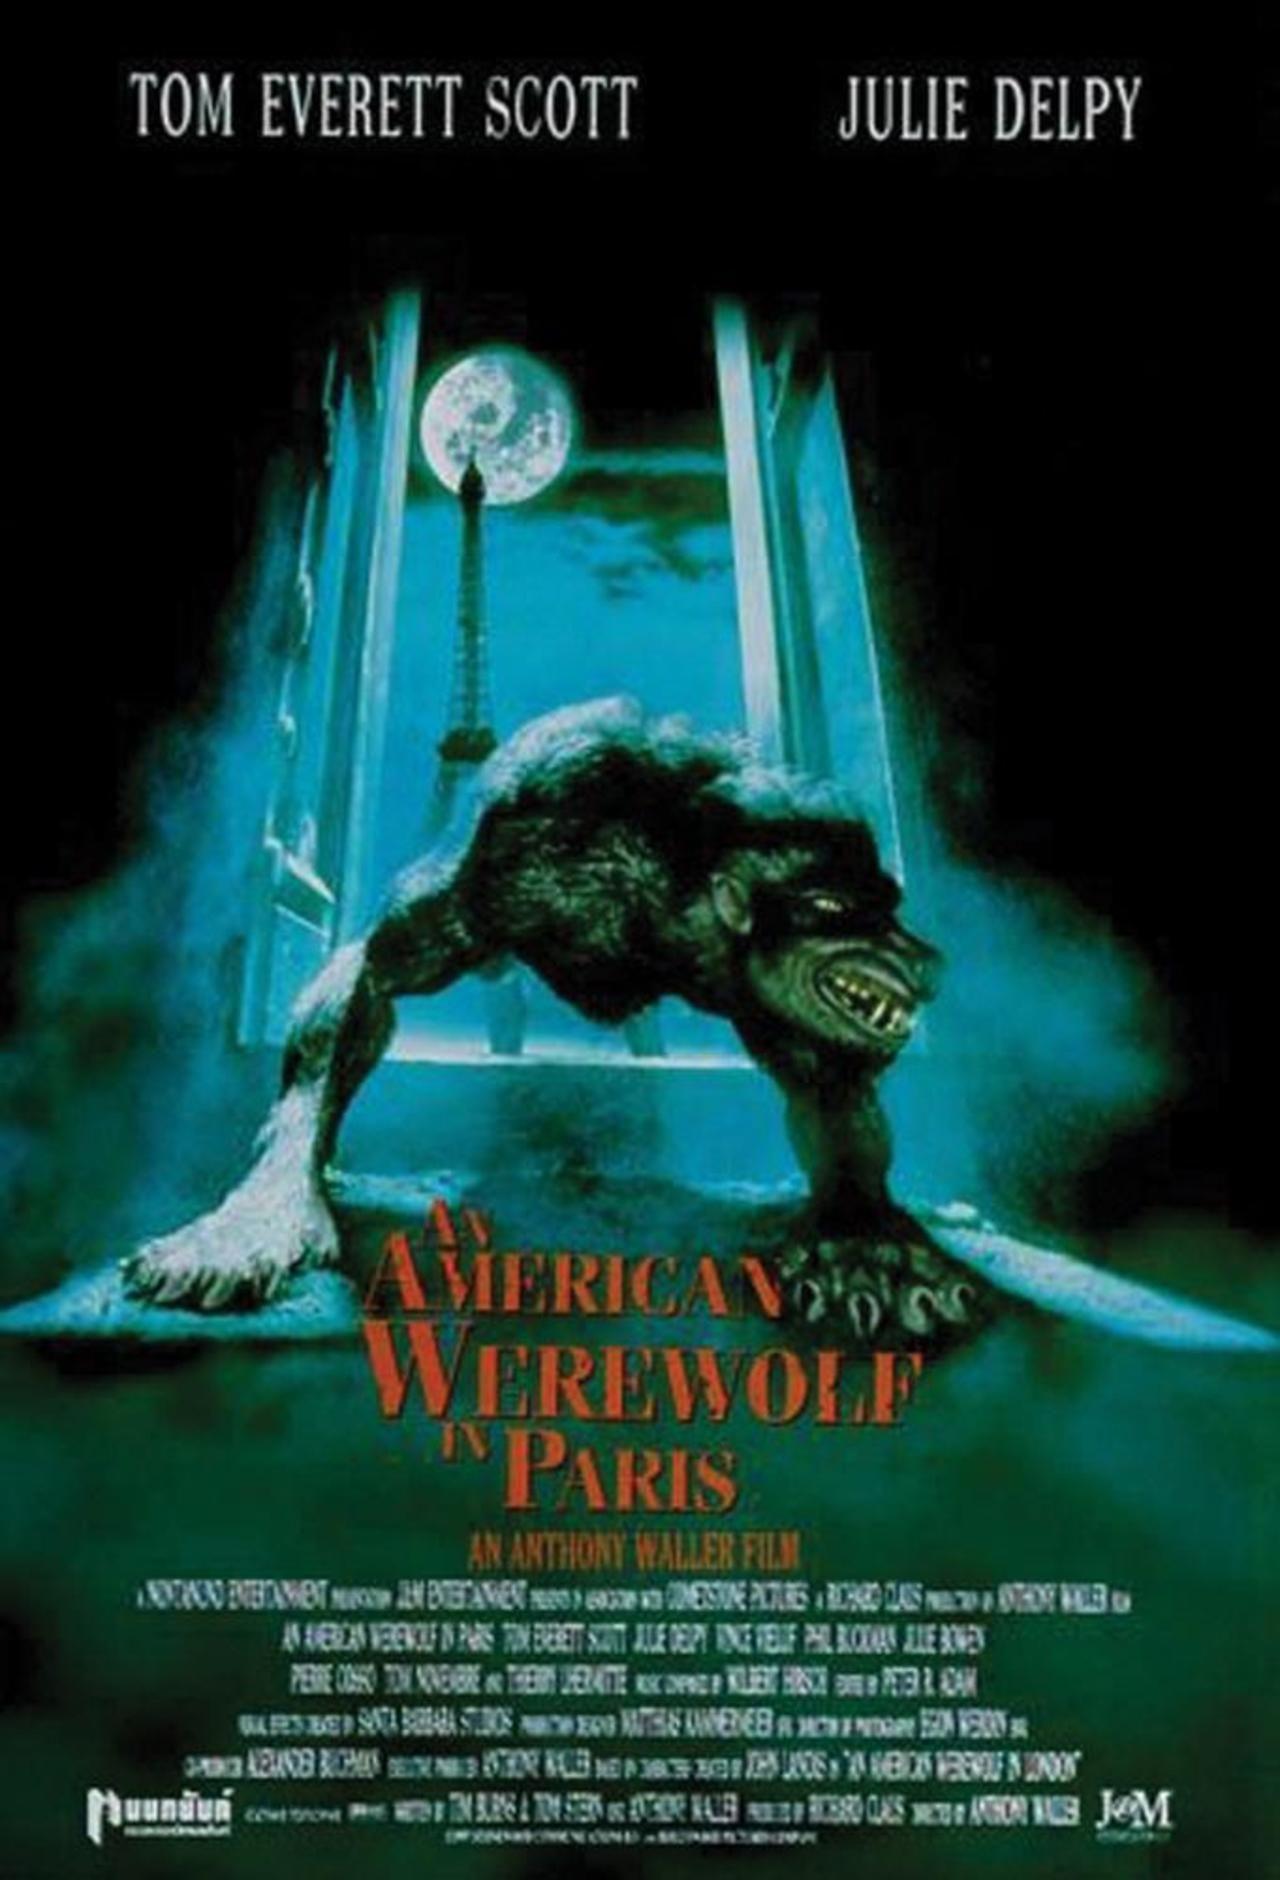 An American Werewolf In Paris American Werewolf In Paris 1997 Werewolf Paris Movie Julie Delpy